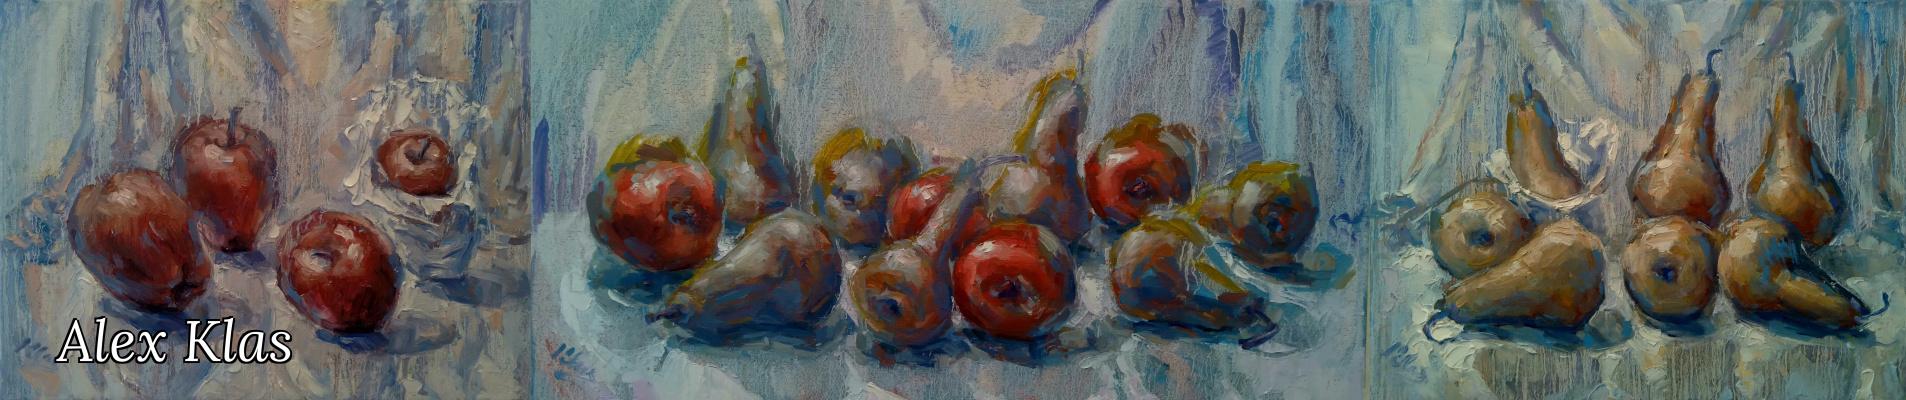 Alex Klas. Pears and Apples - (Triptych)